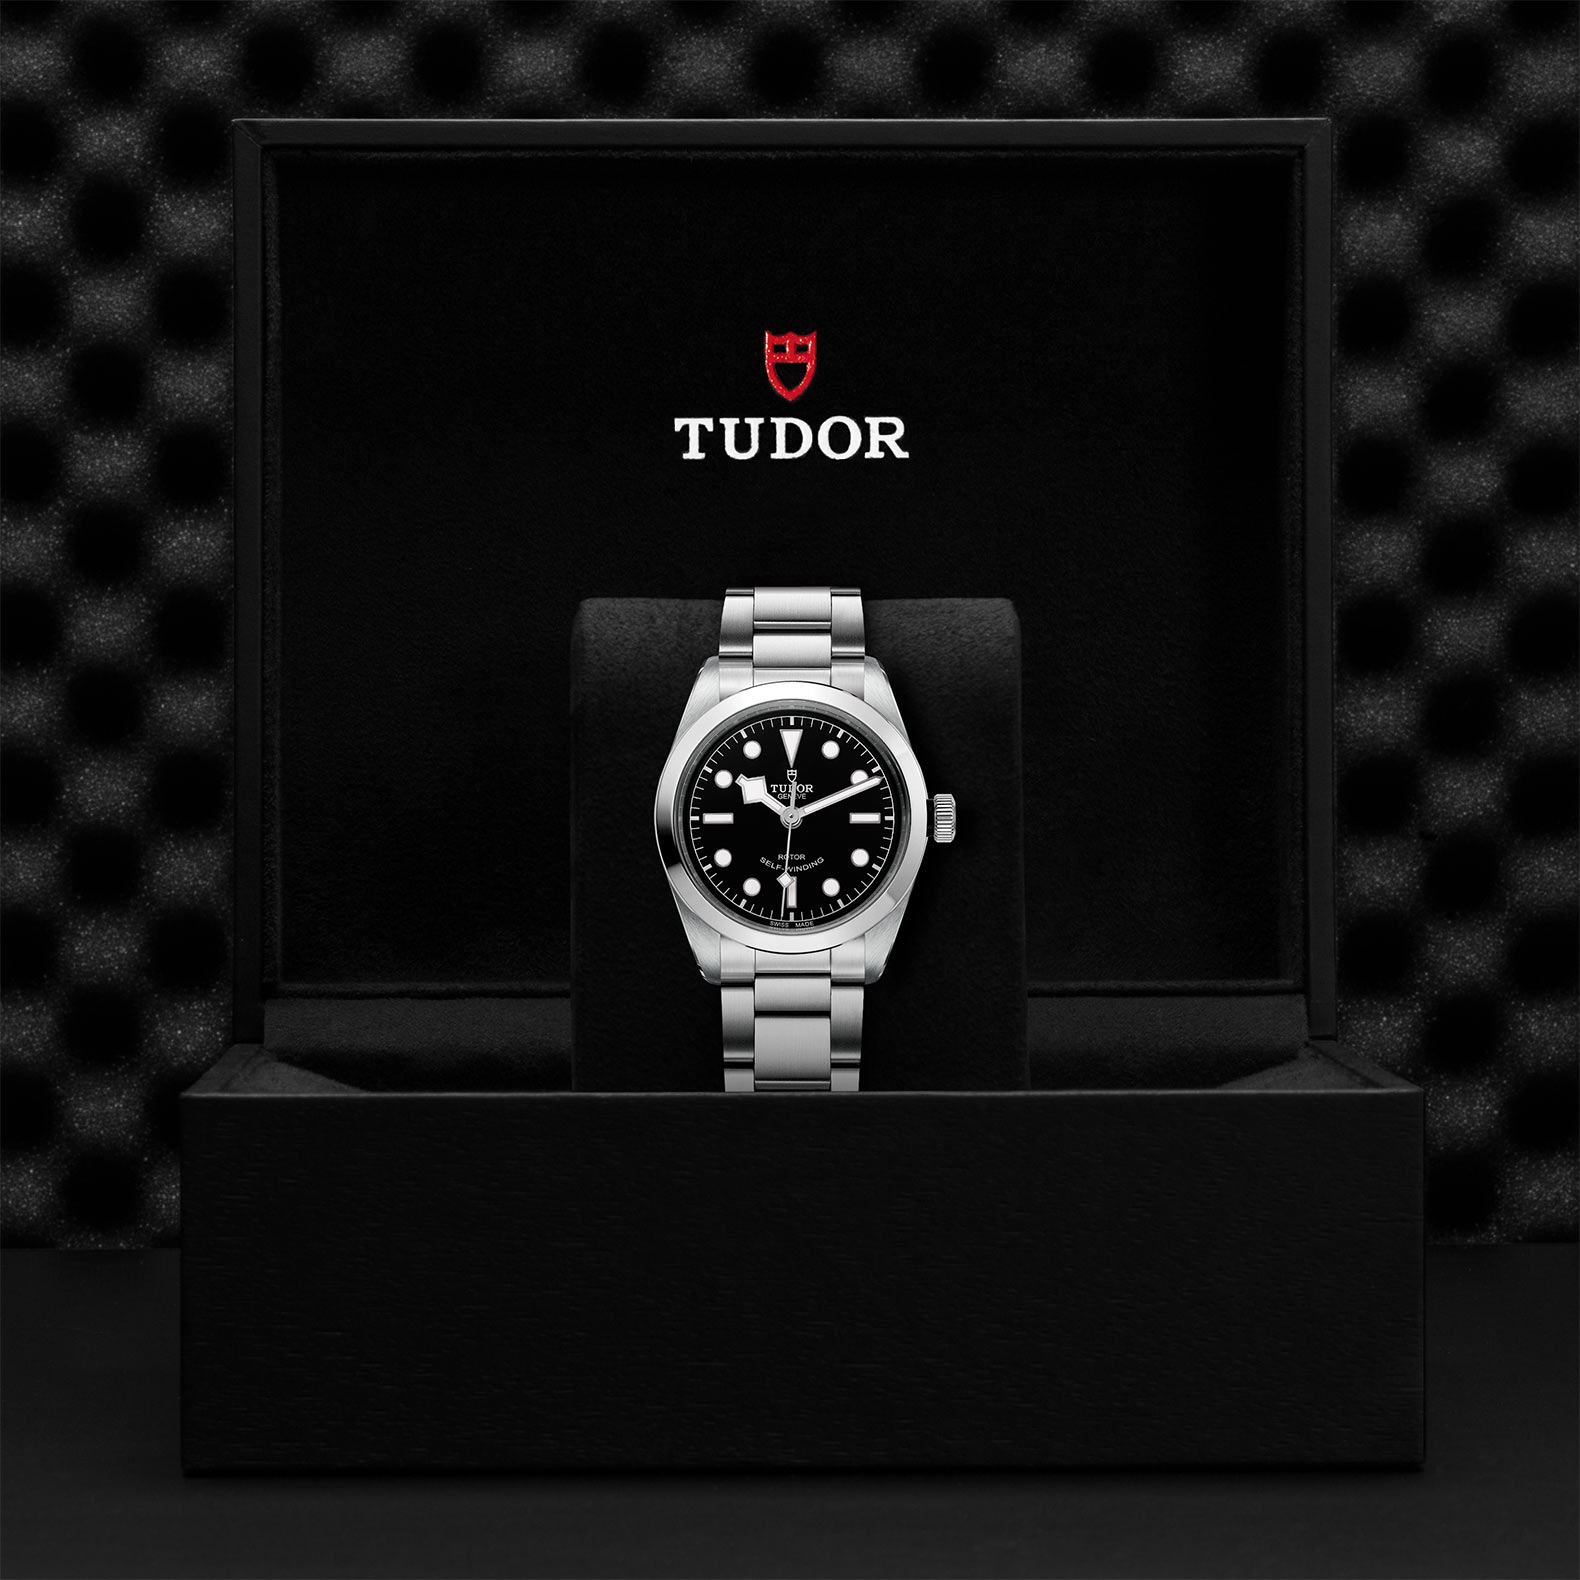 TUDOR Black Bay 36 M79500 0007 Presentation